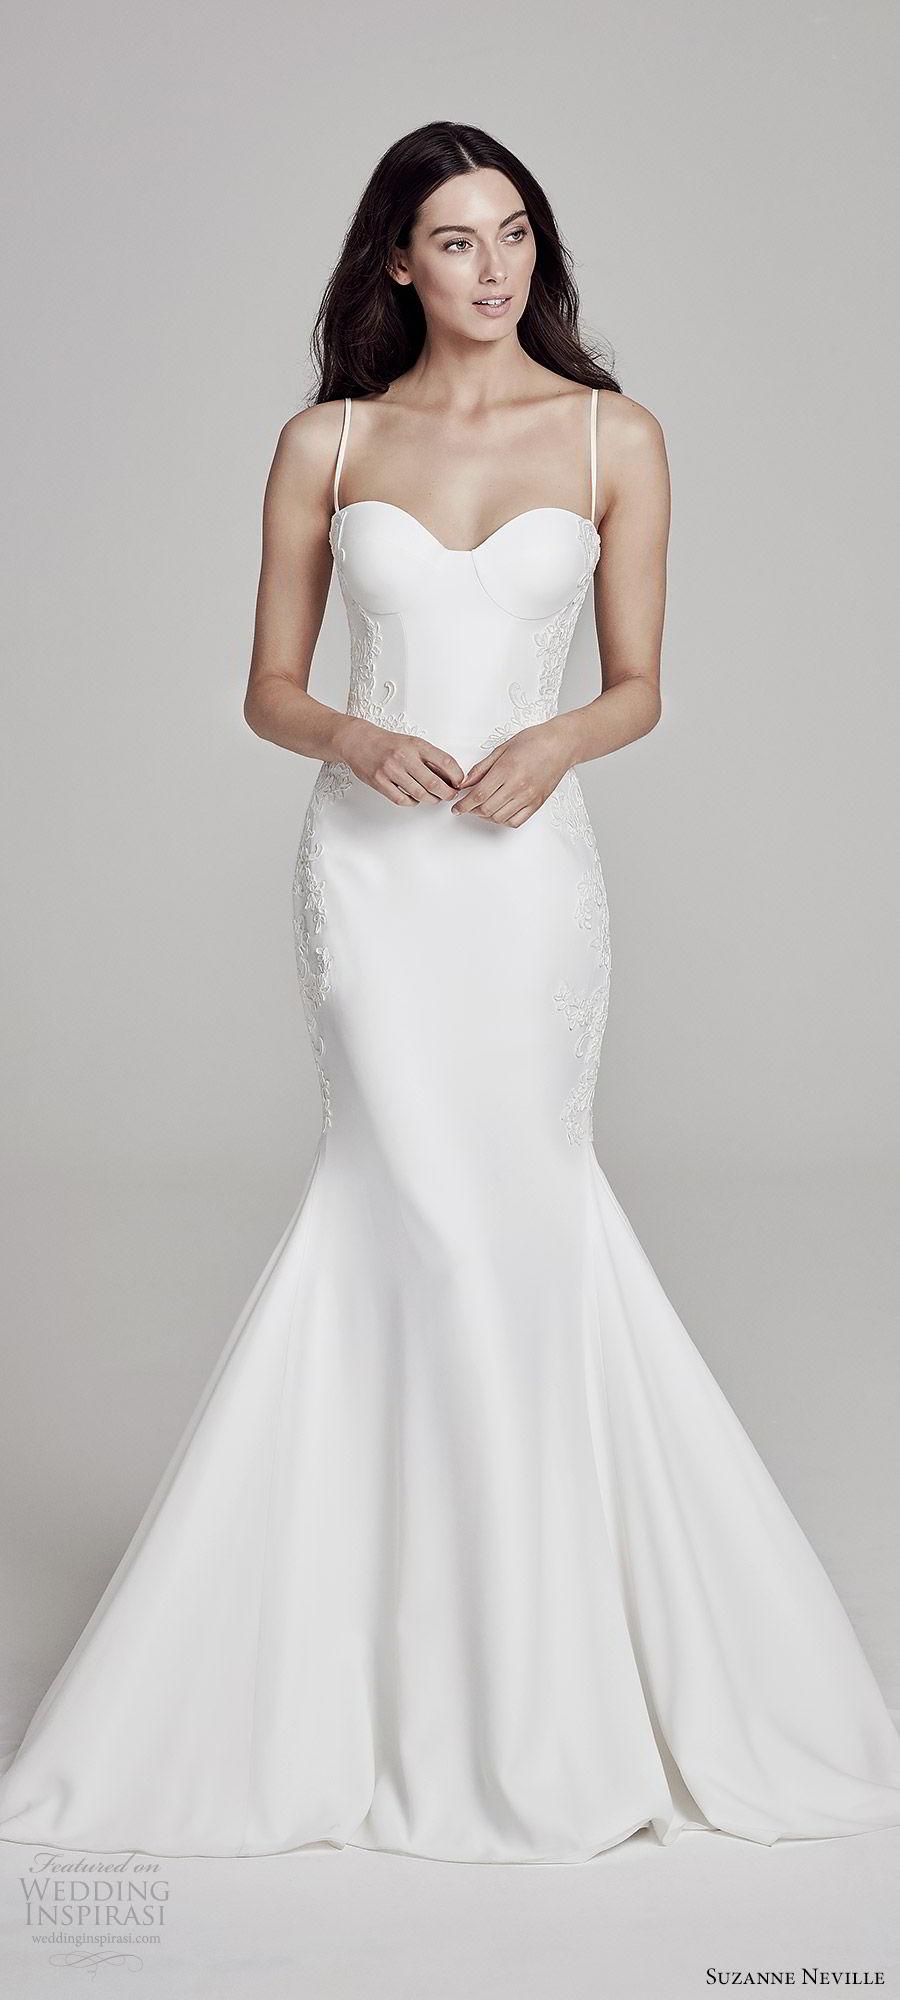 suzanne neville bridal 2019 sleeveless thin straps sweetheart mermaid wedding dress (leandra) sweep train modern elegant mv